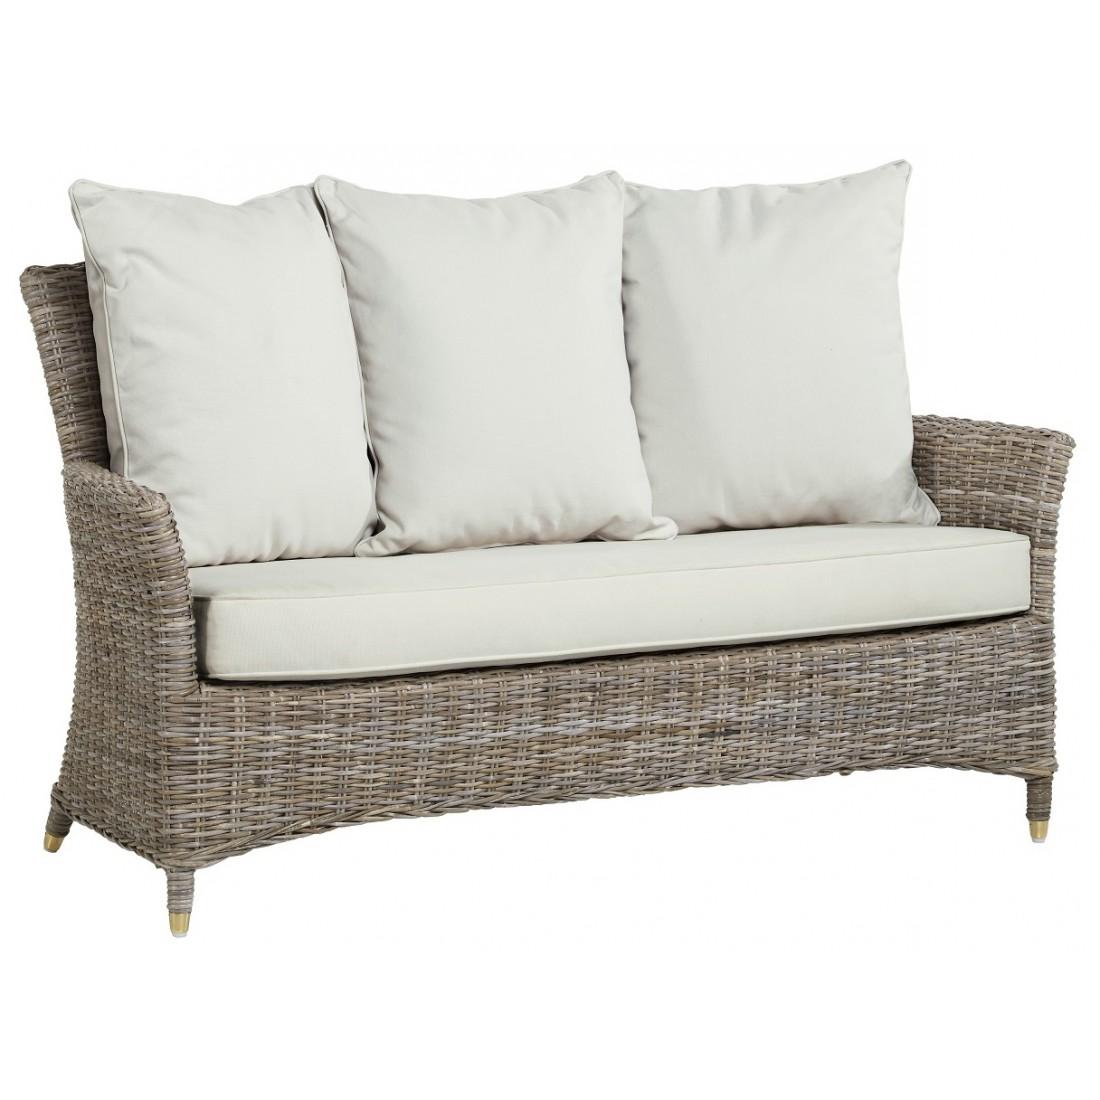 Nevis sofa in grey kooboo rattan with cushion for Sofa rattan jardin